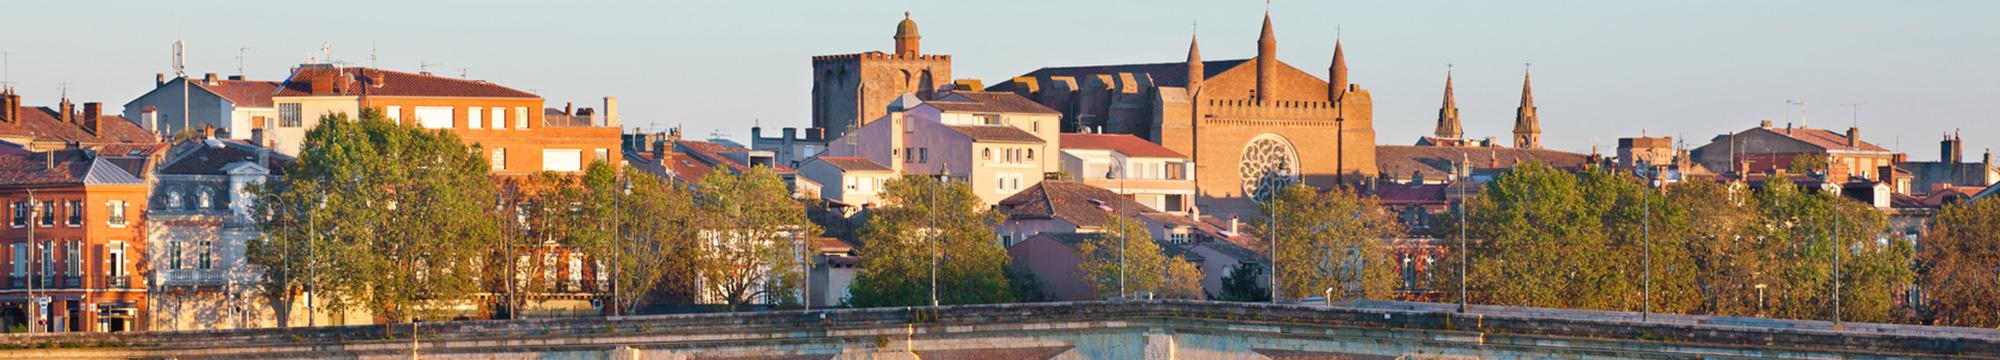 Alternance Midi-Pyrénées – Toulouse